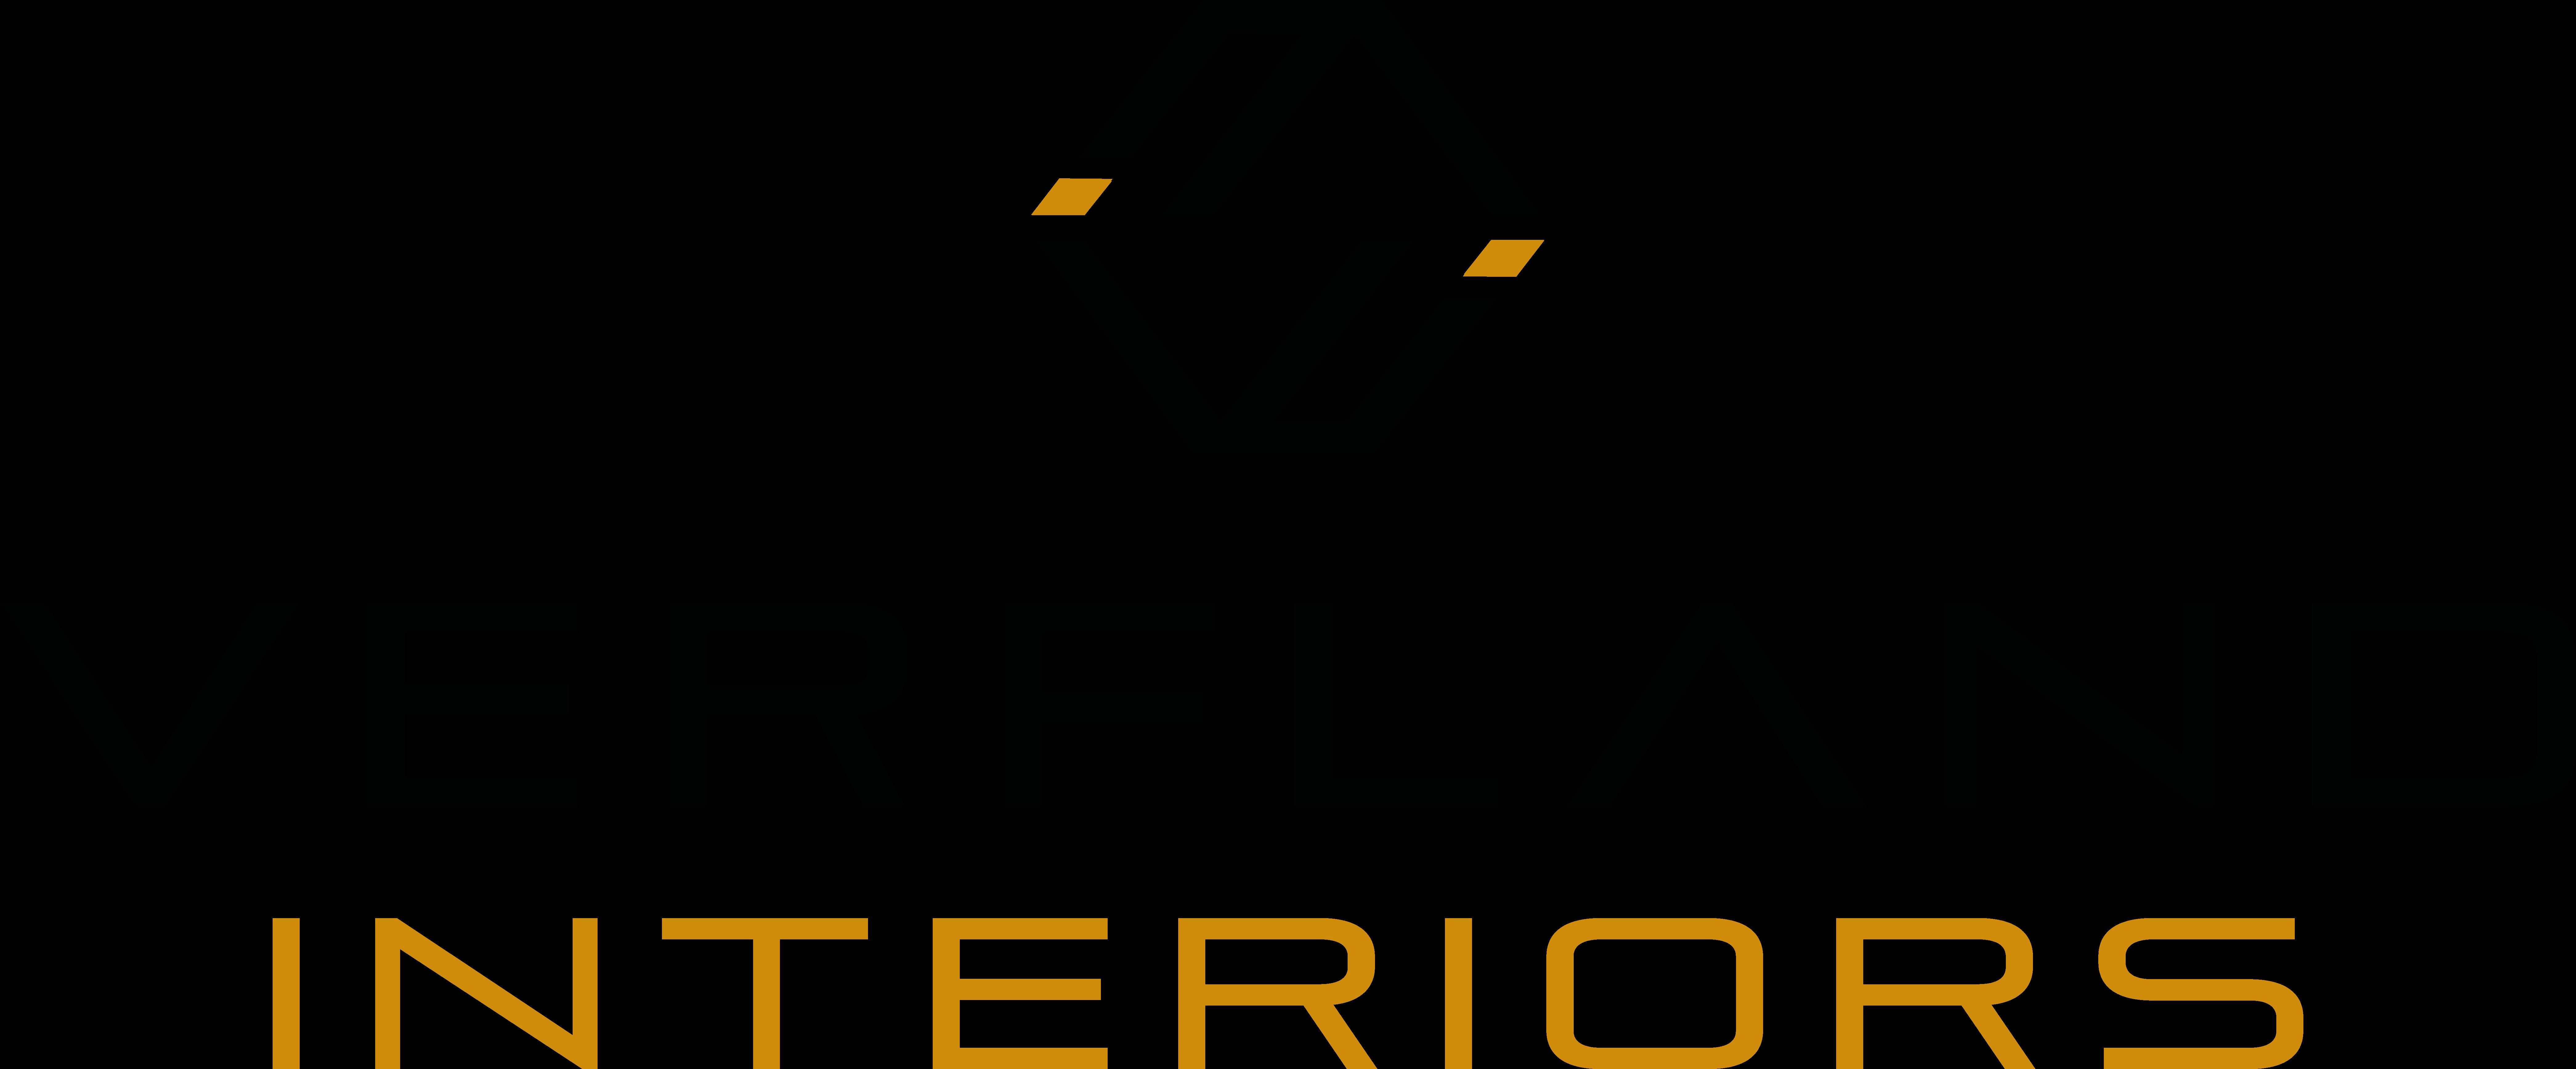 cropped verfland logo light